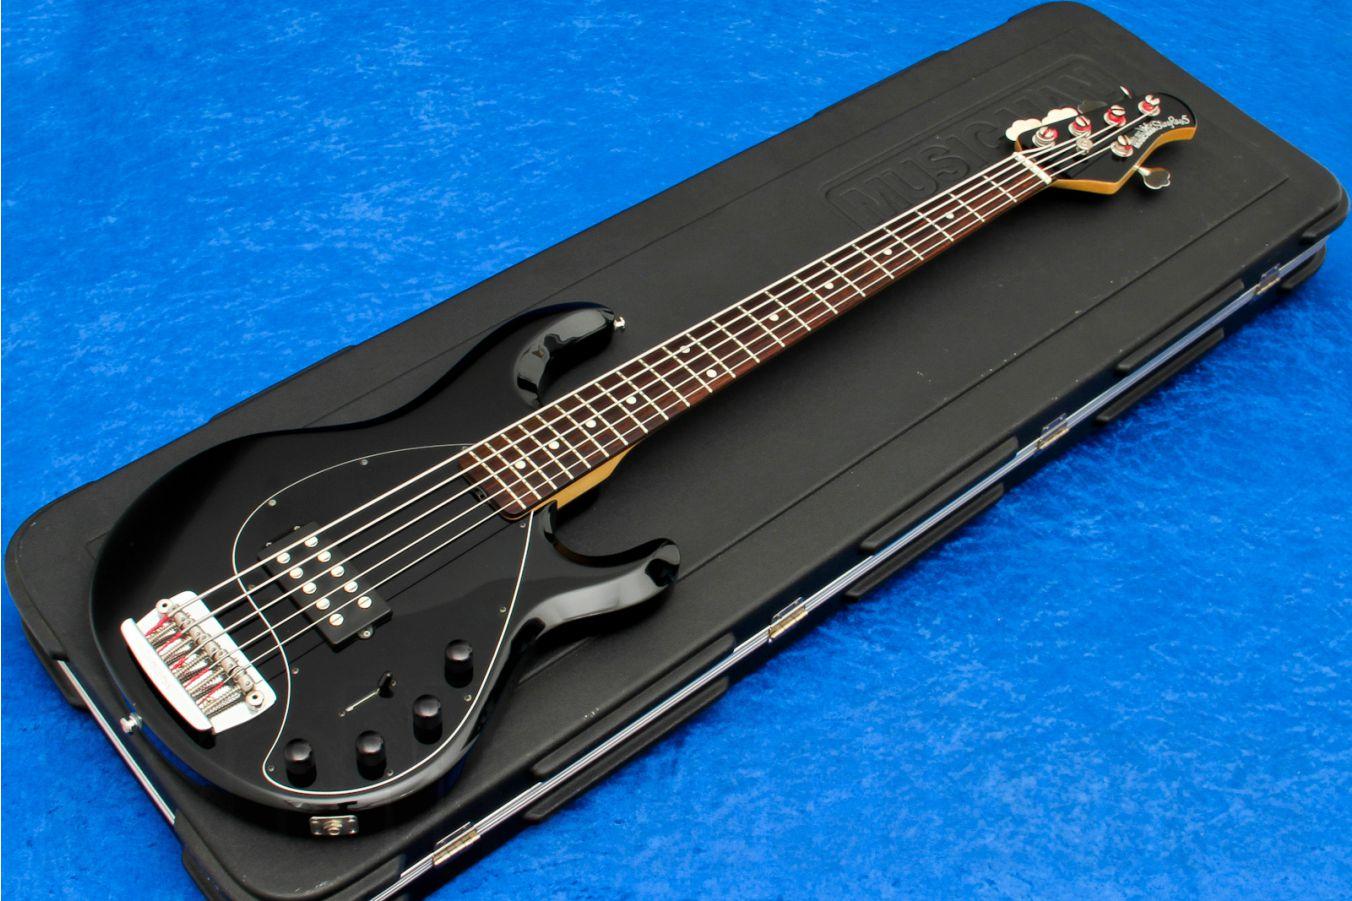 Music Man USA Stingray 5 BK - Black RW MH